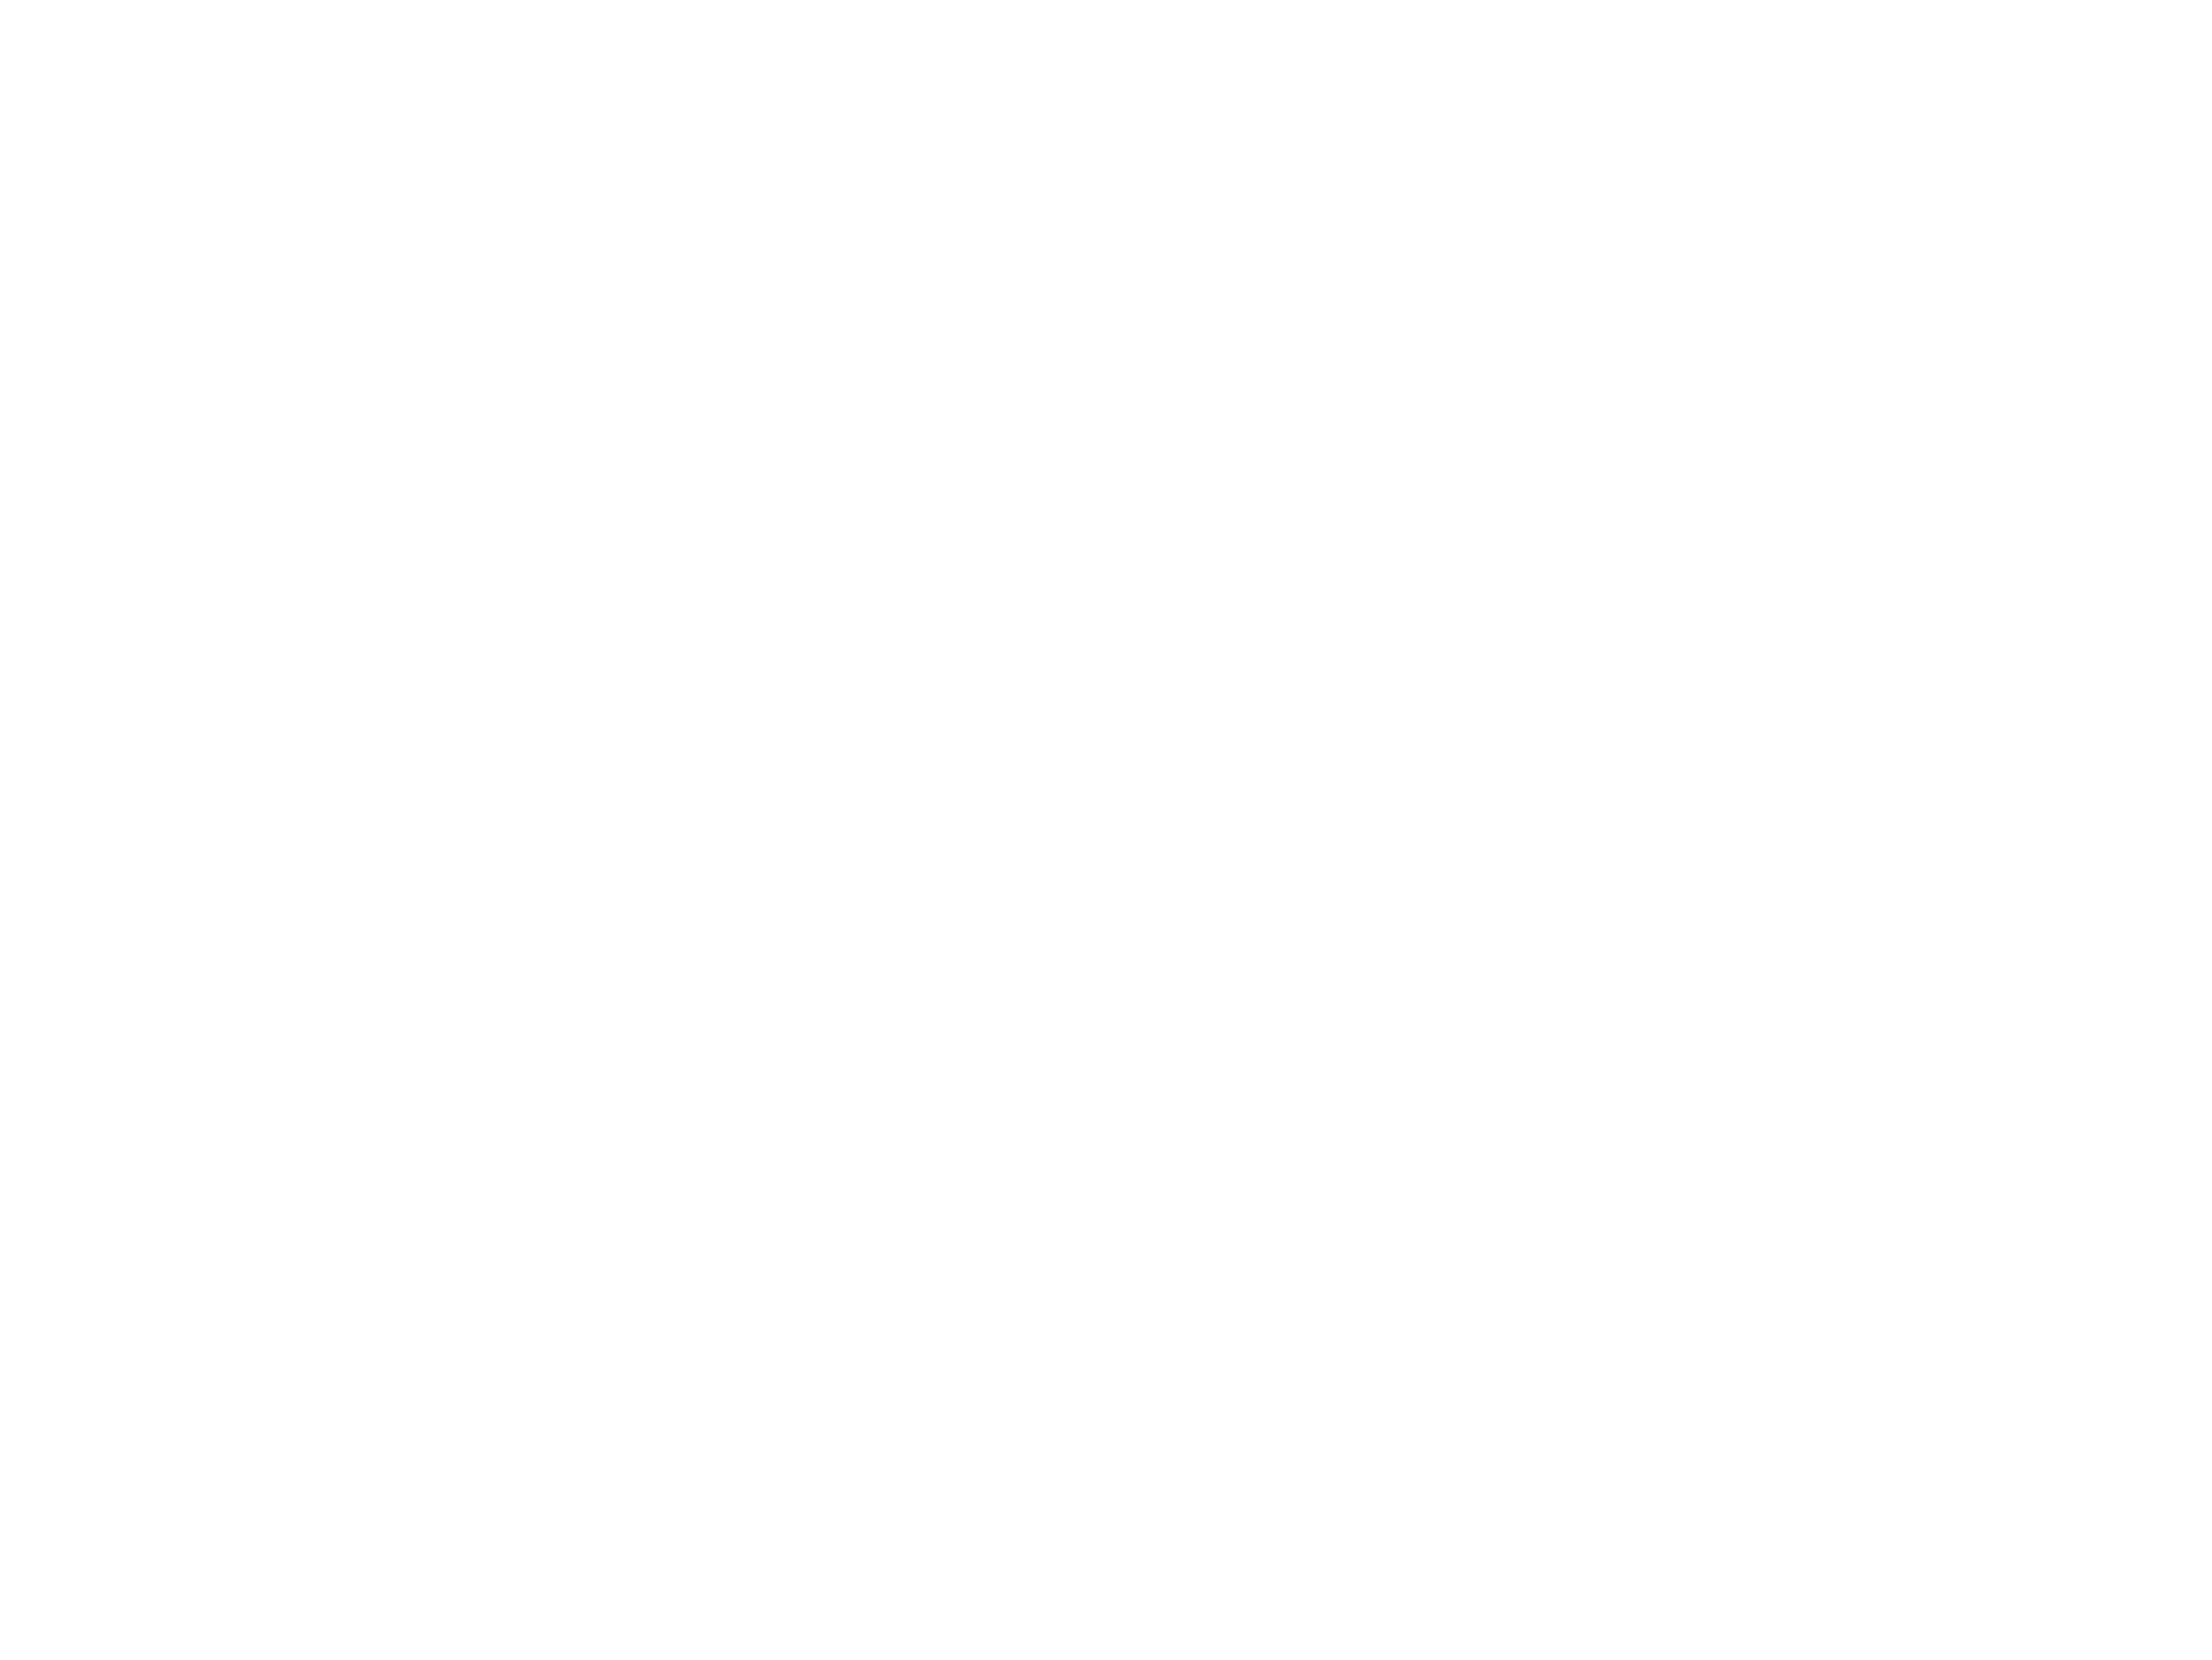 origine bufflonne italie